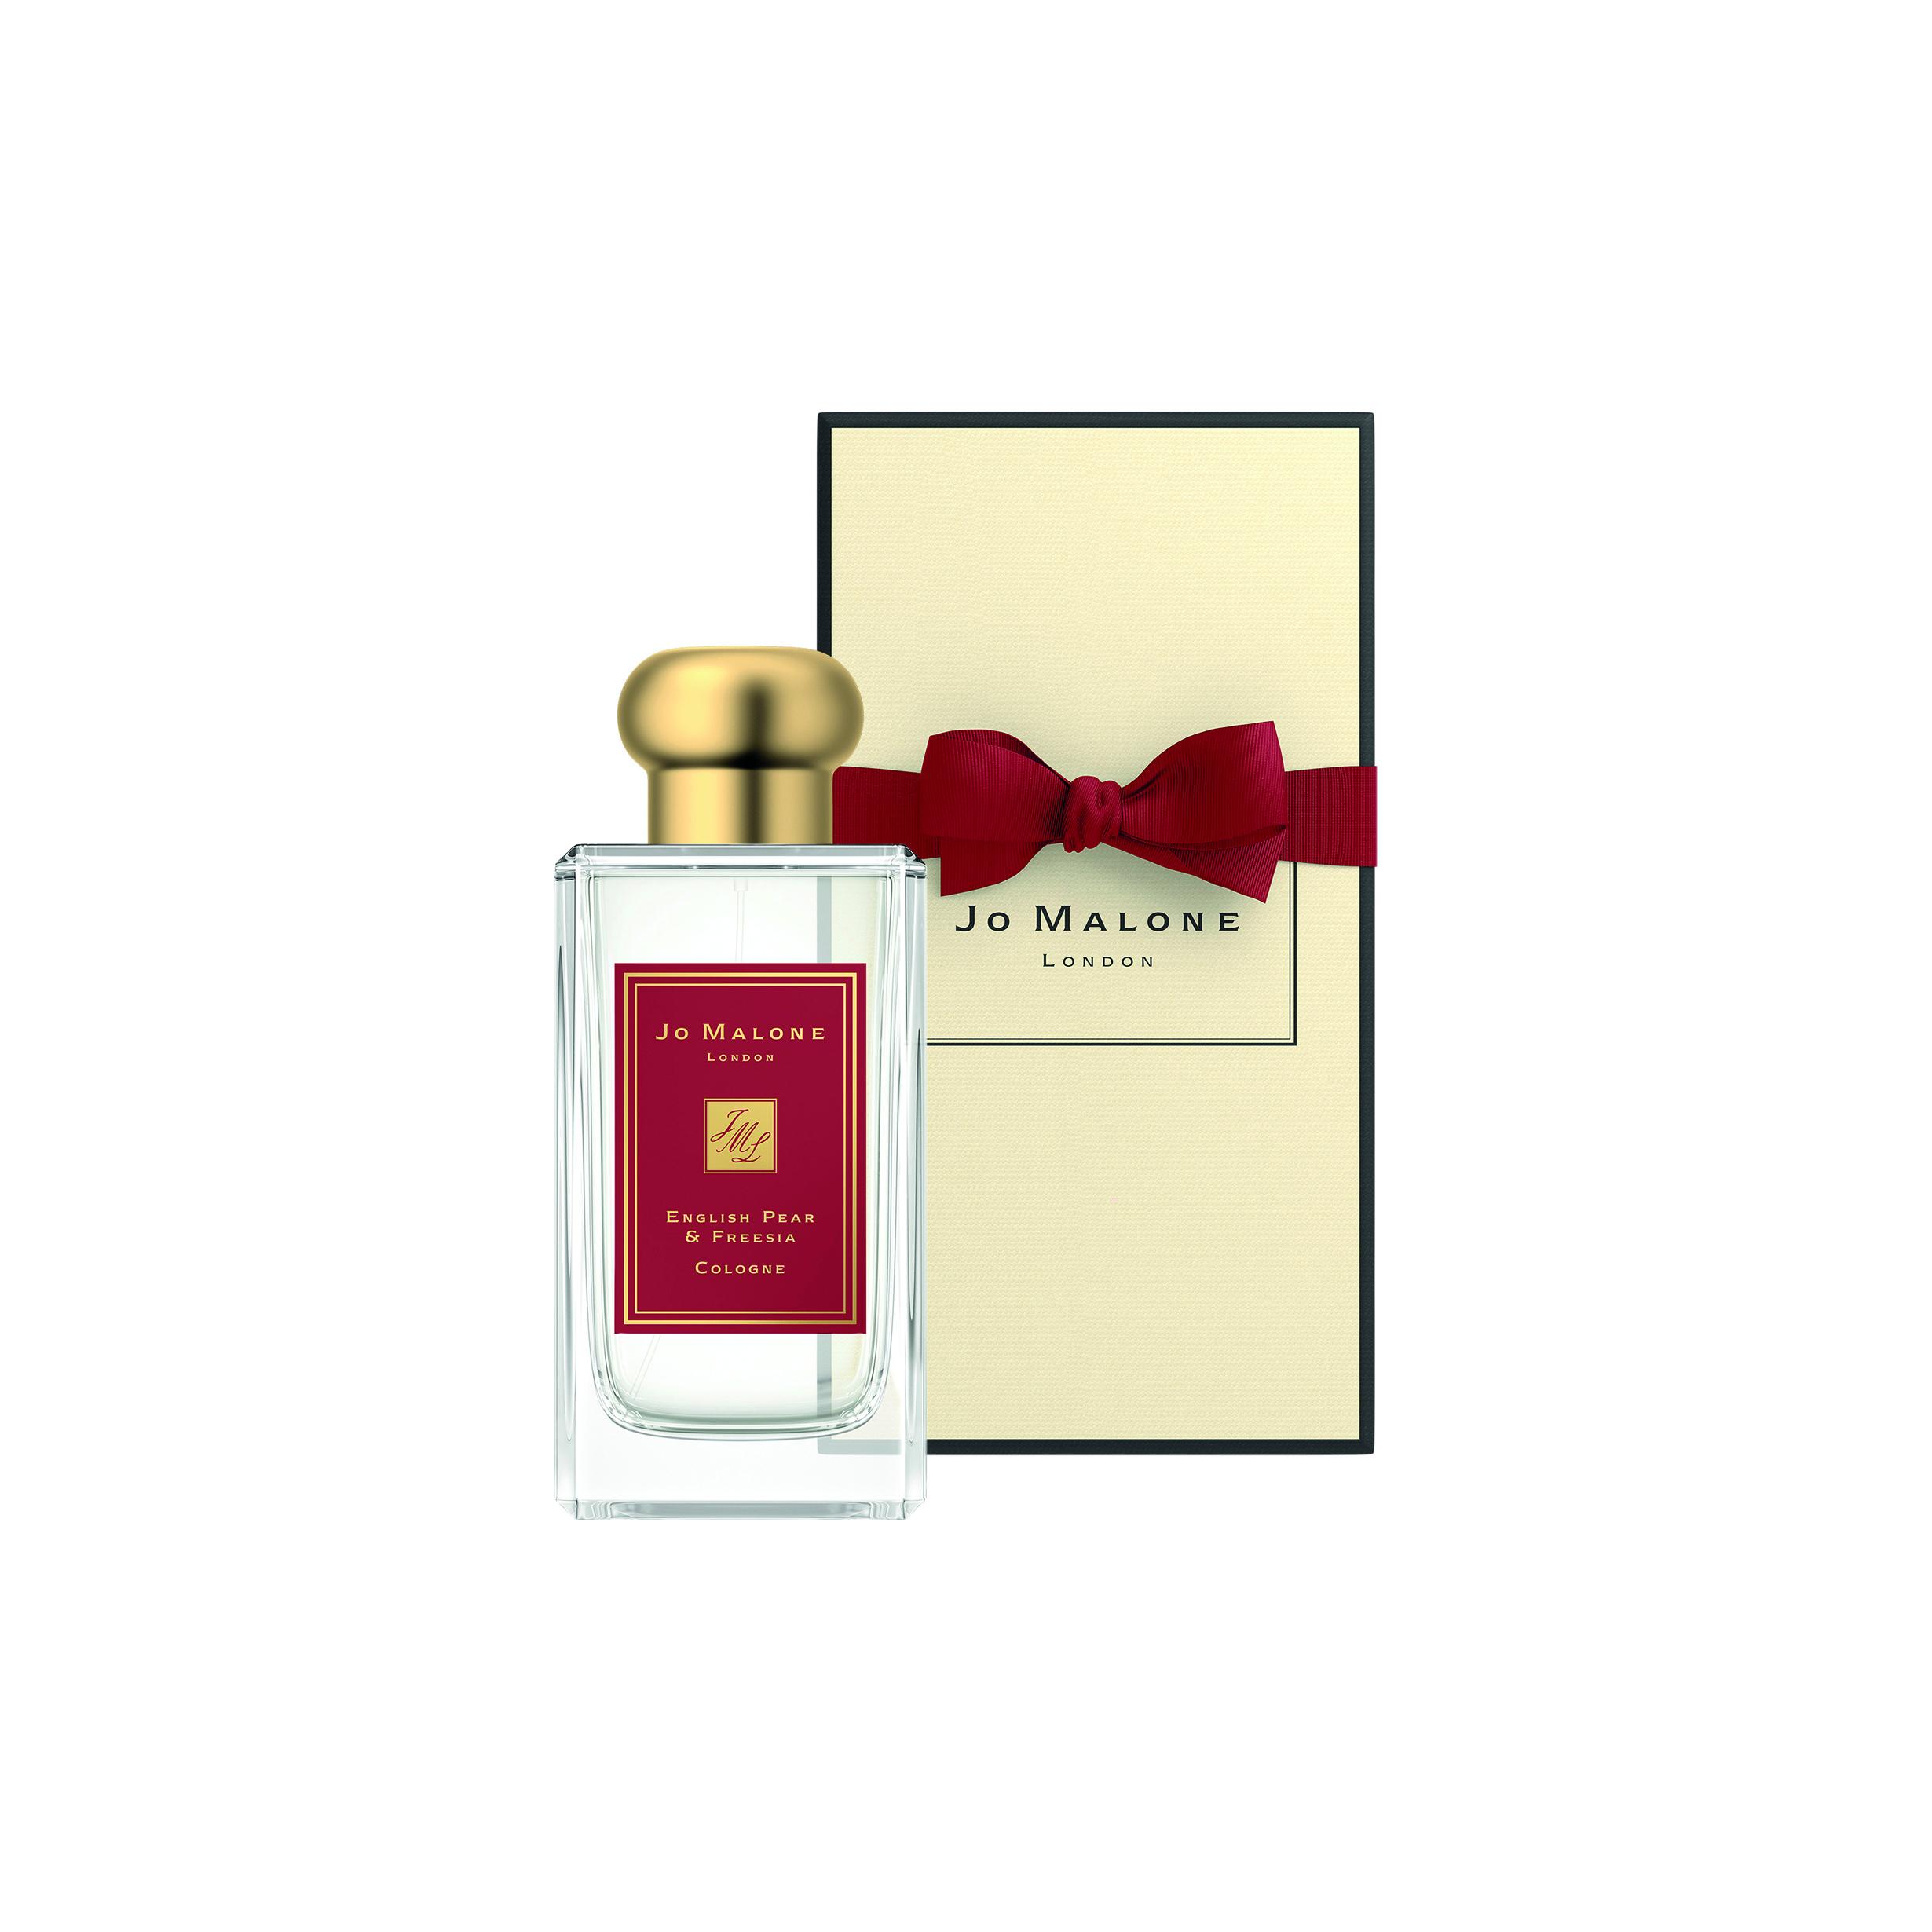 Jo Malone London - Gold Capped Perfume